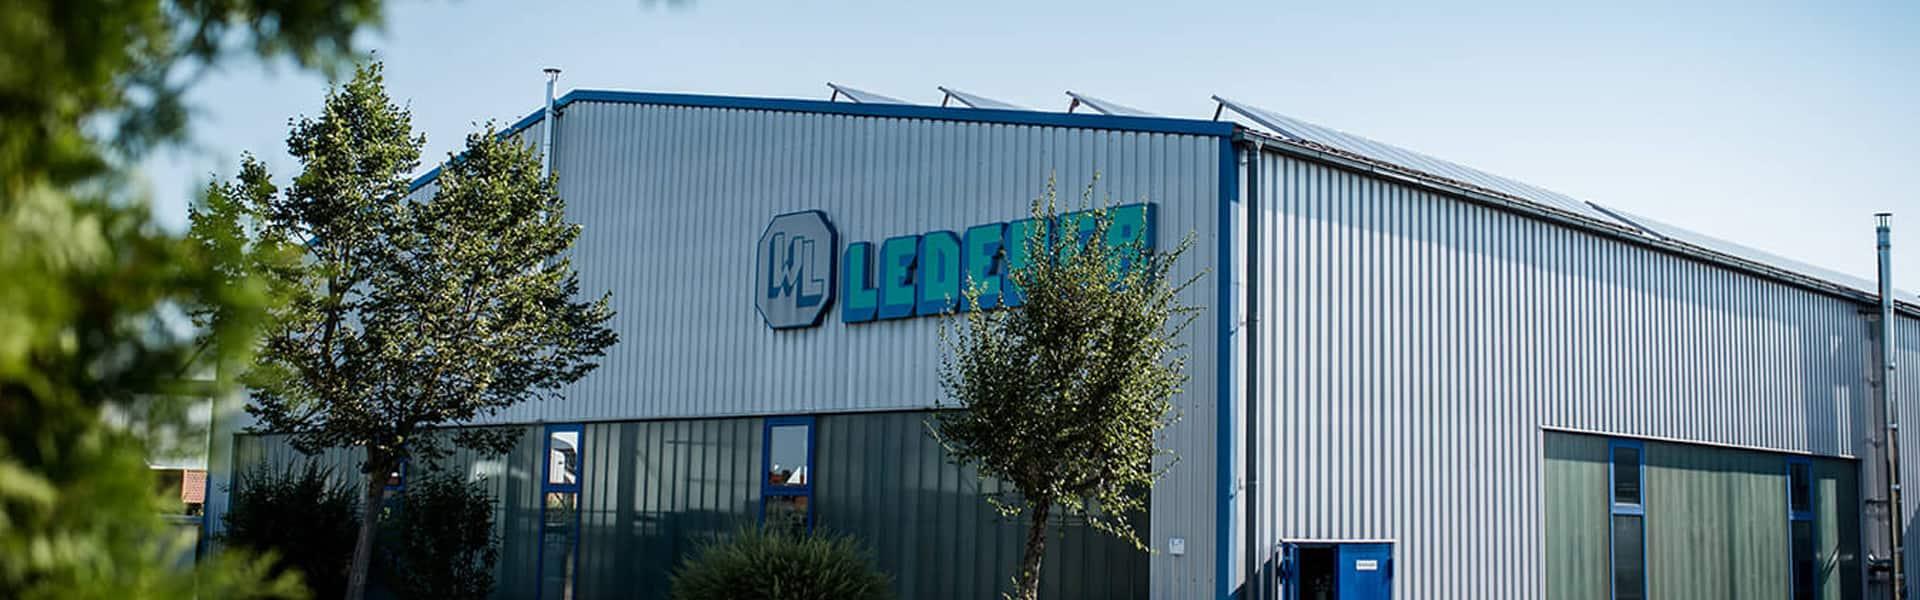 Lederer Maschinenbau-Landtechnik GmbH